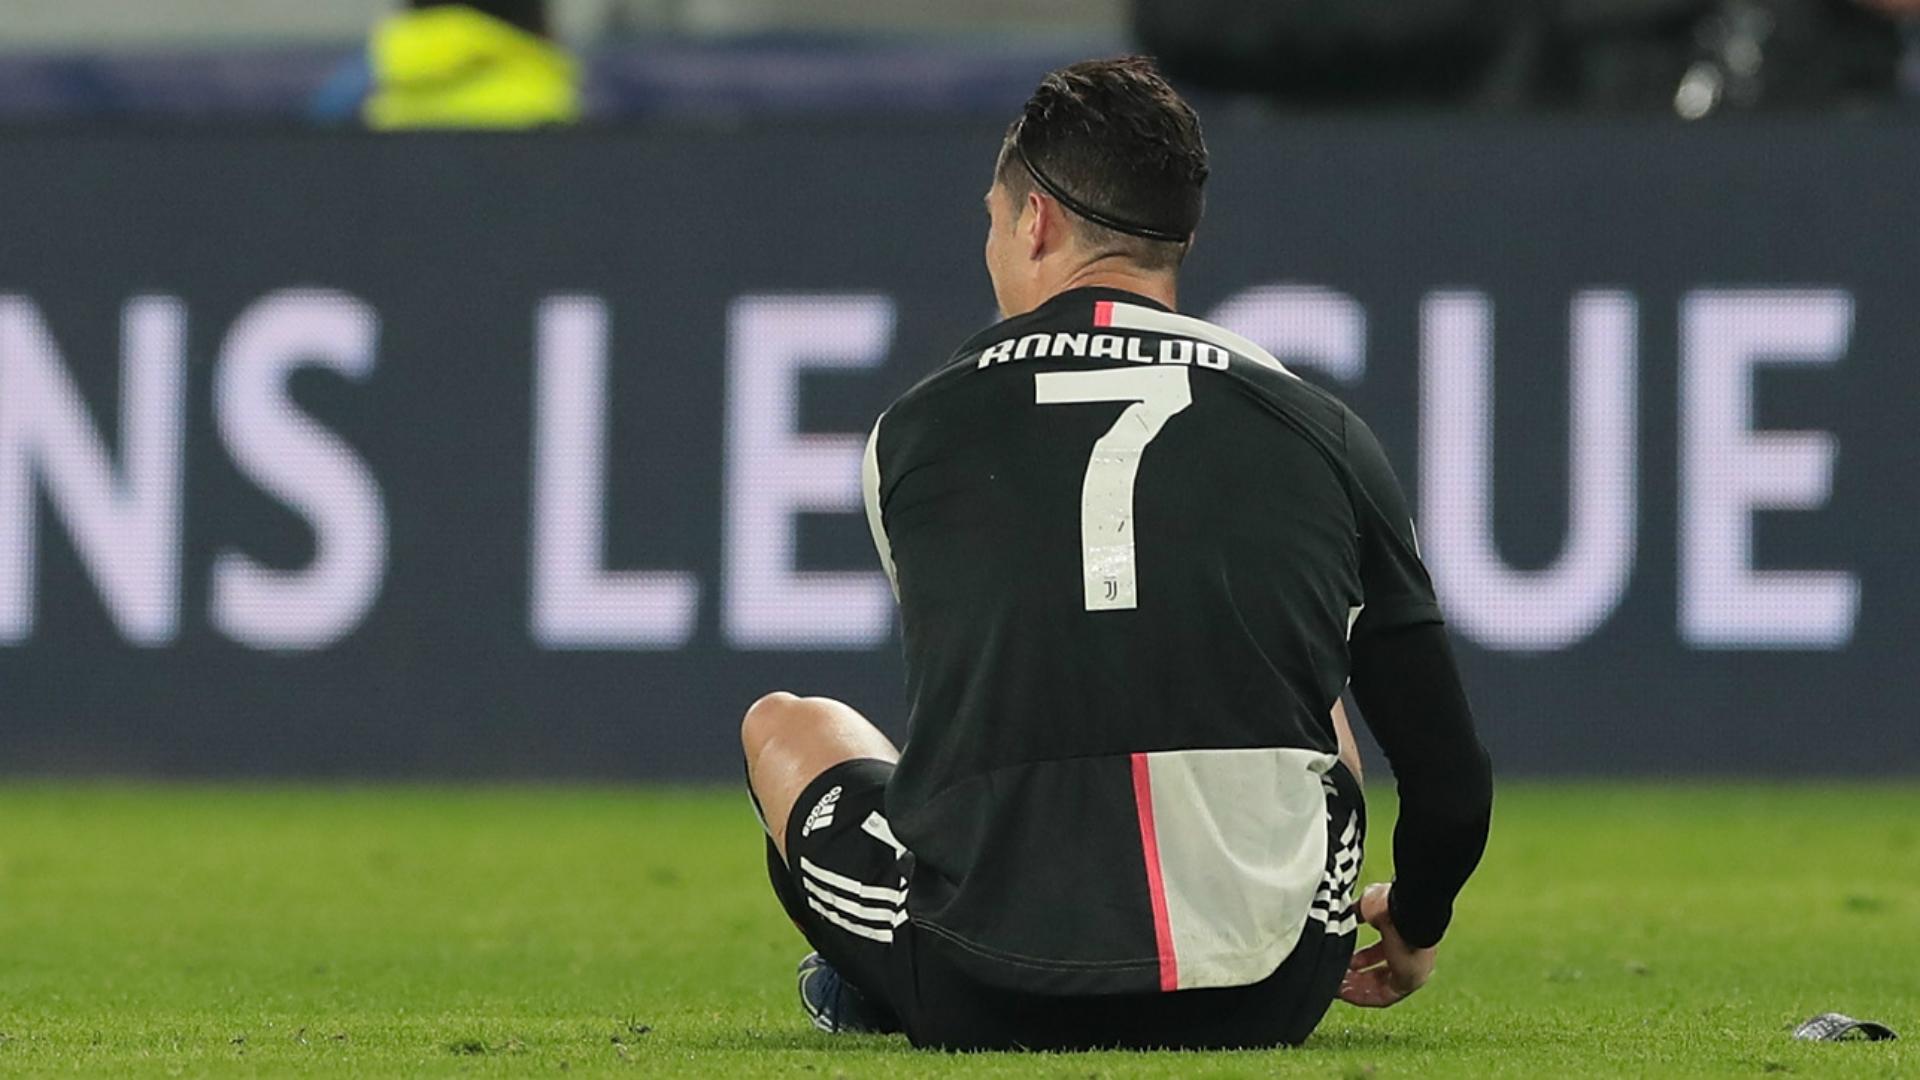 Sarri to discuss knee pain with Ronaldo as Juventus star looks to regain full fitness